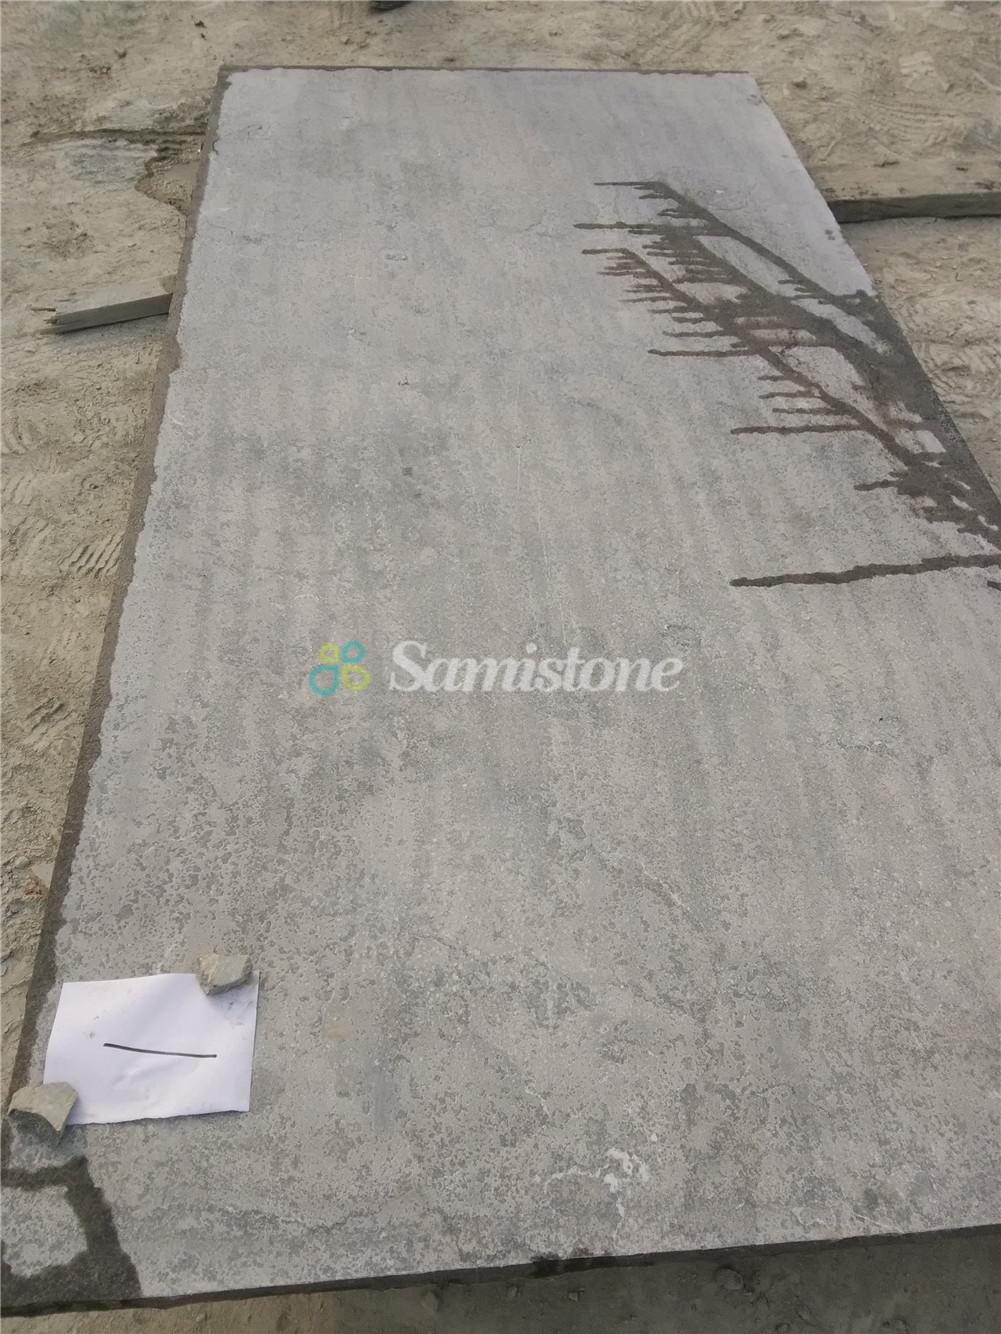 Samistone Blue Limestone Polished Slab Paver Outdoor